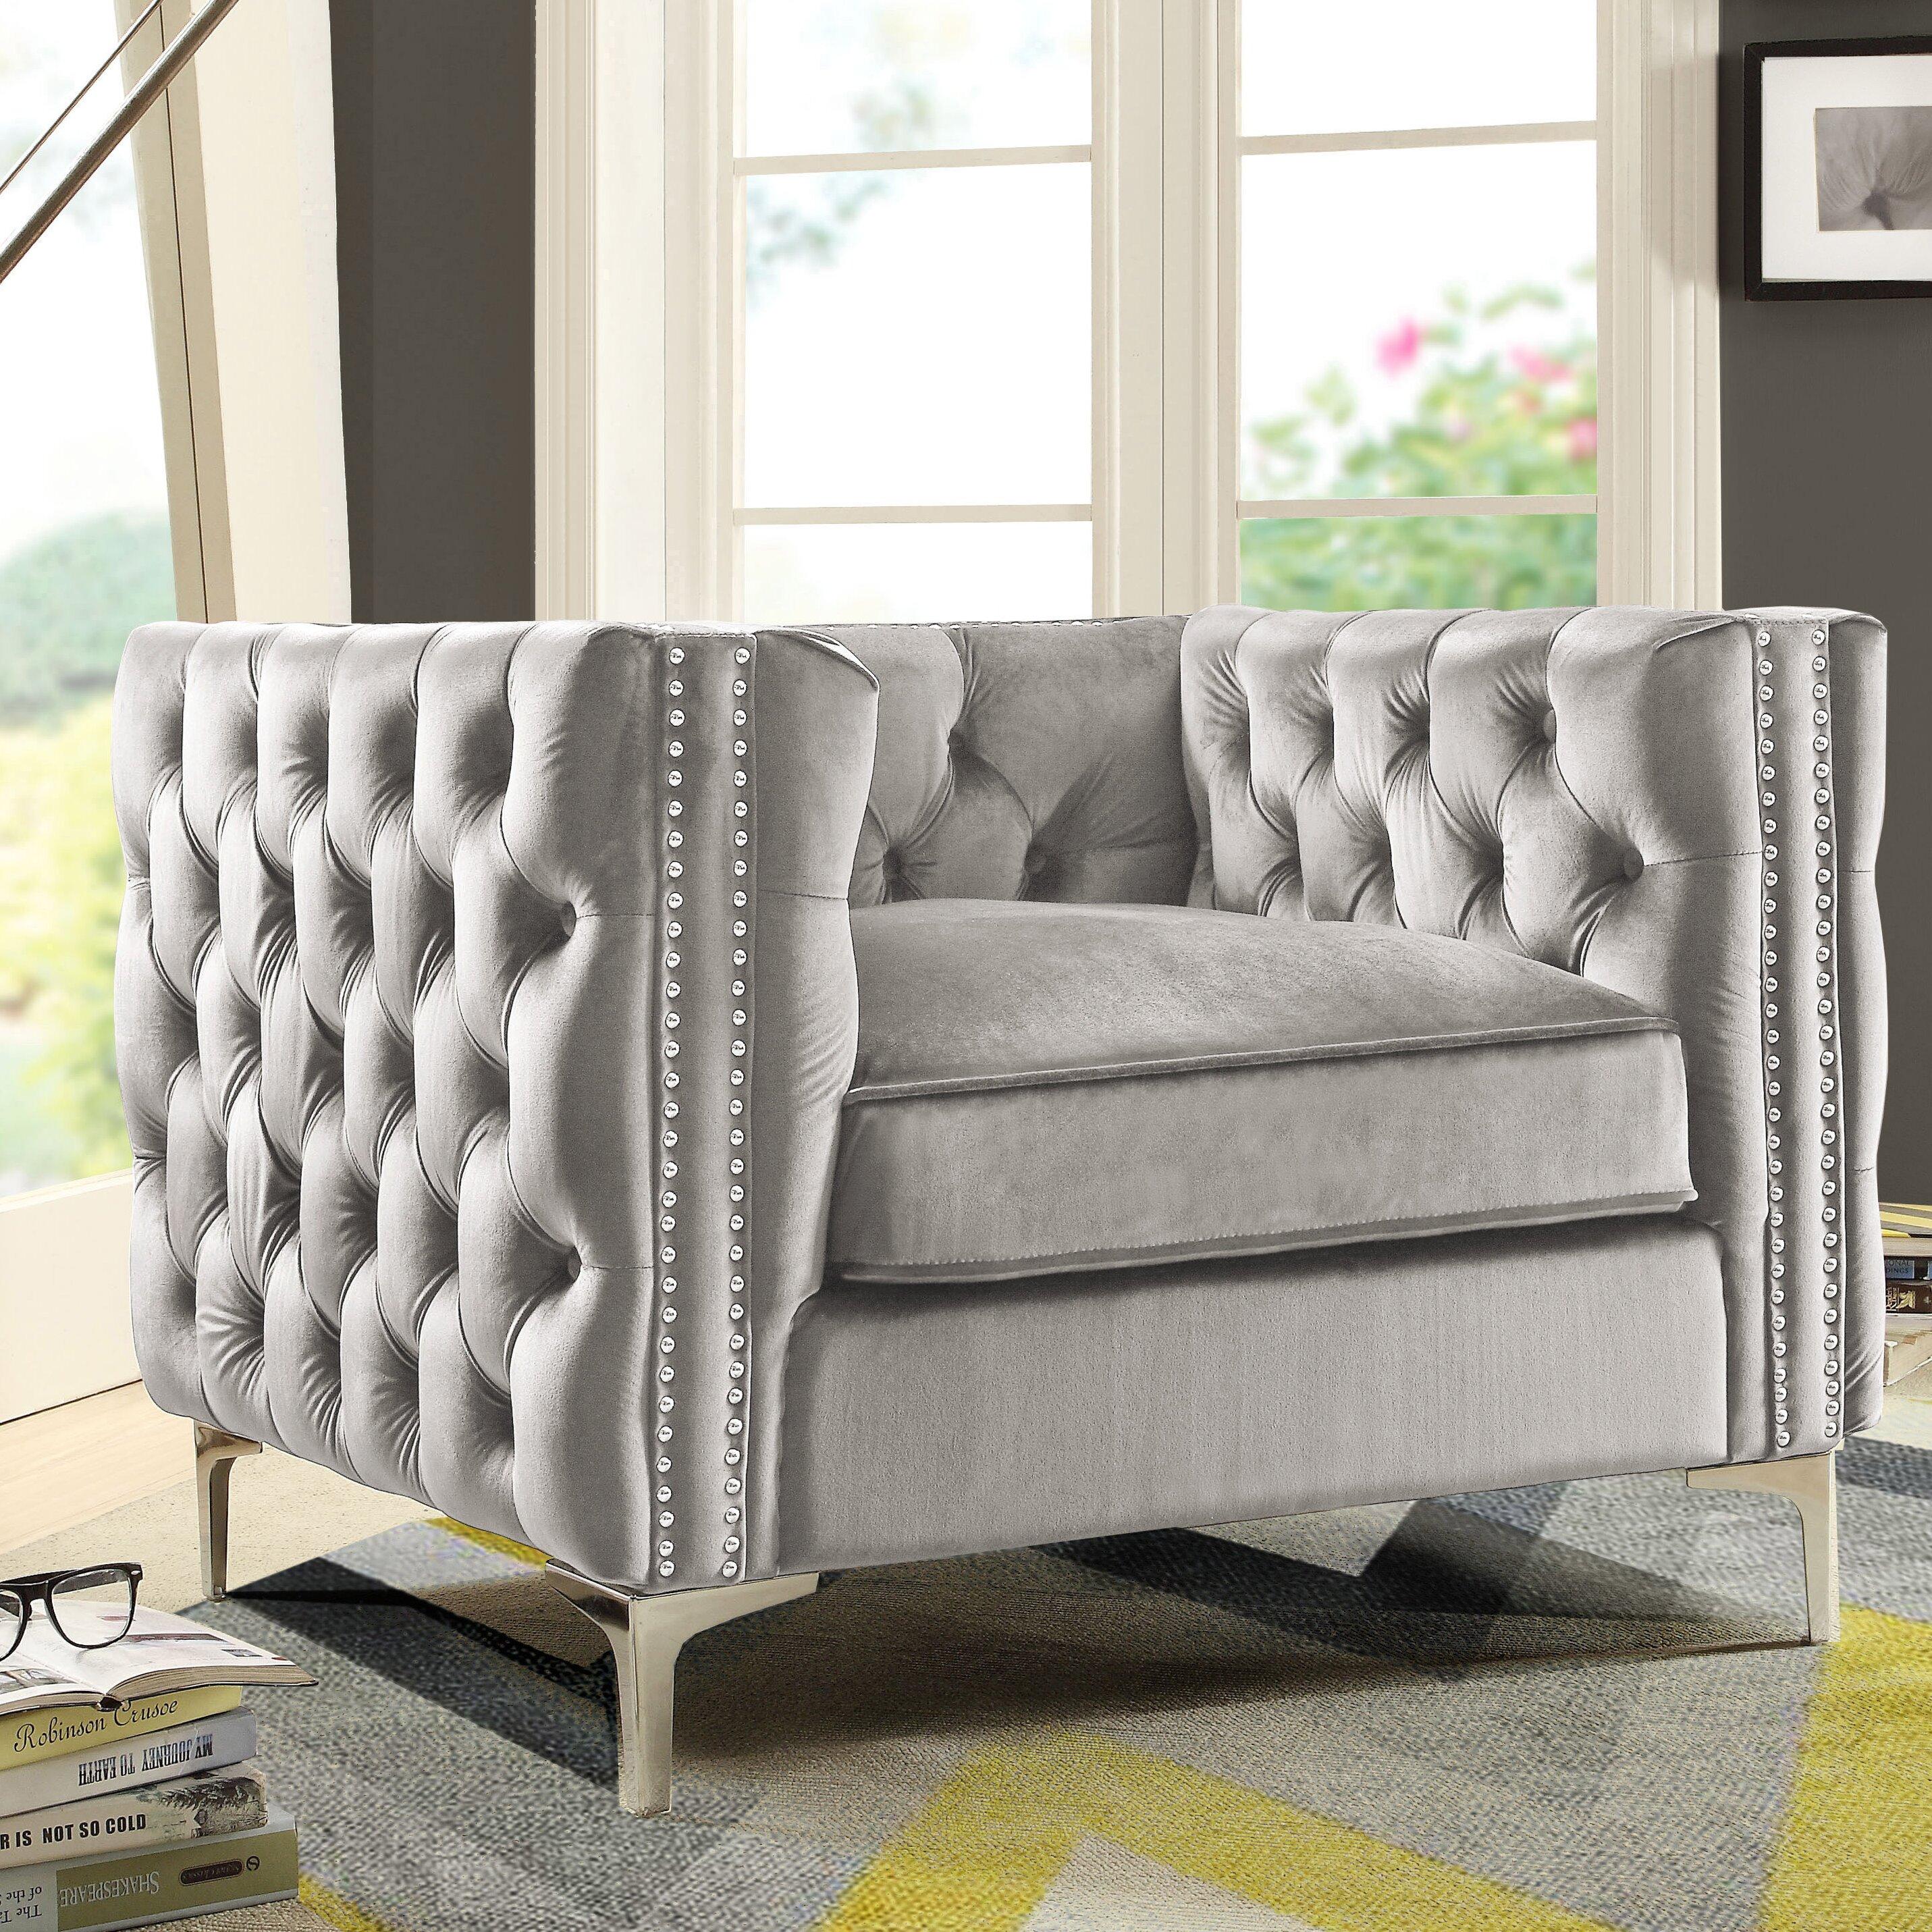 Sofa da vinci jakarta Vastu home furniture jakarta